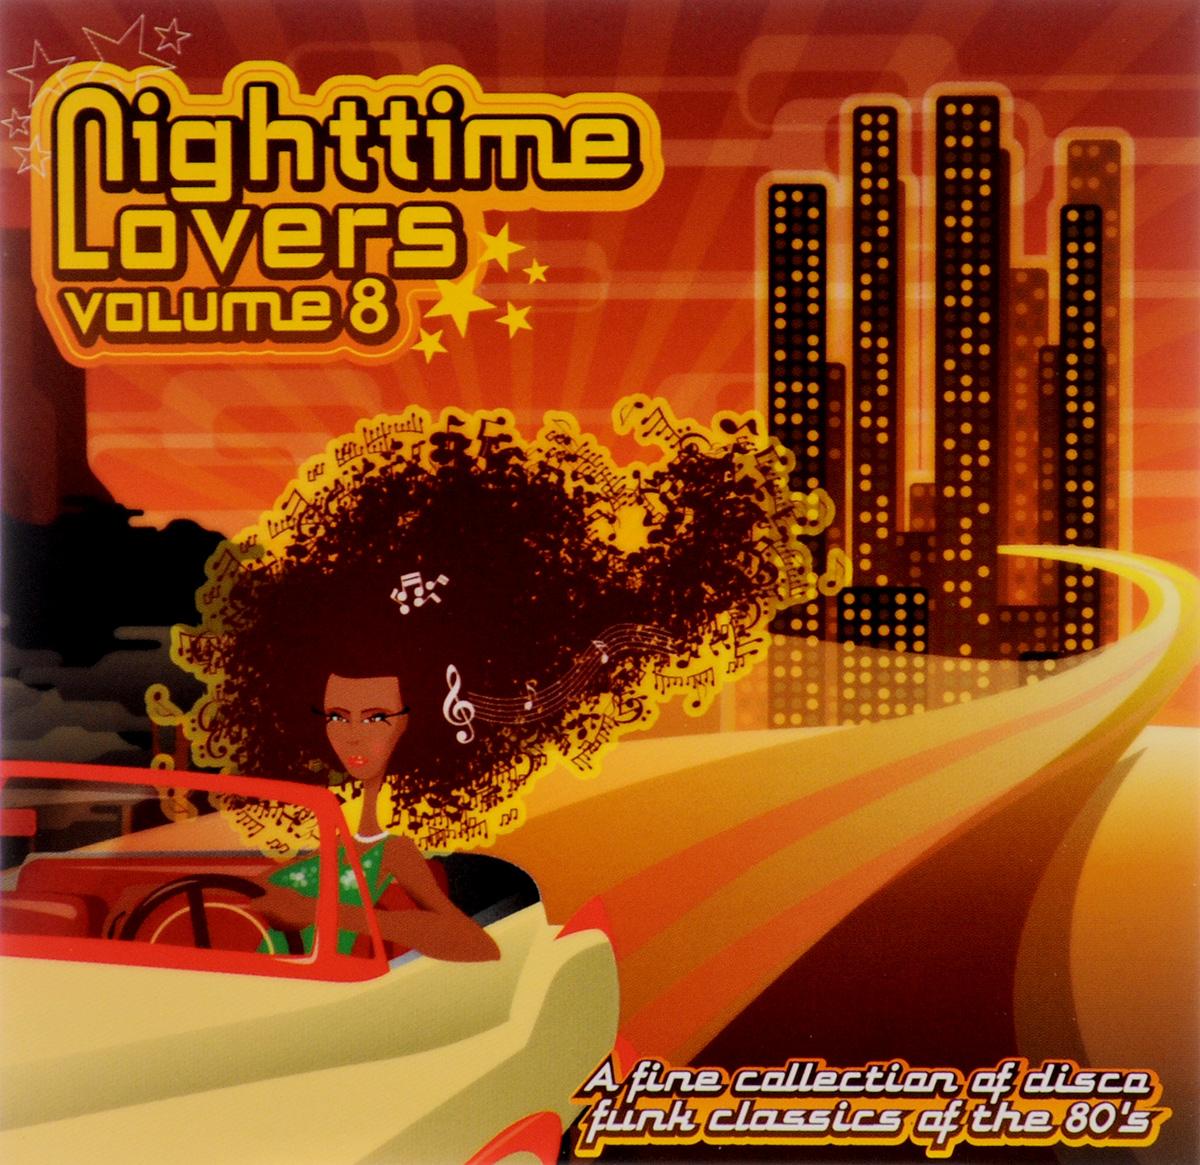 Nighttime Lovers. Volume 8